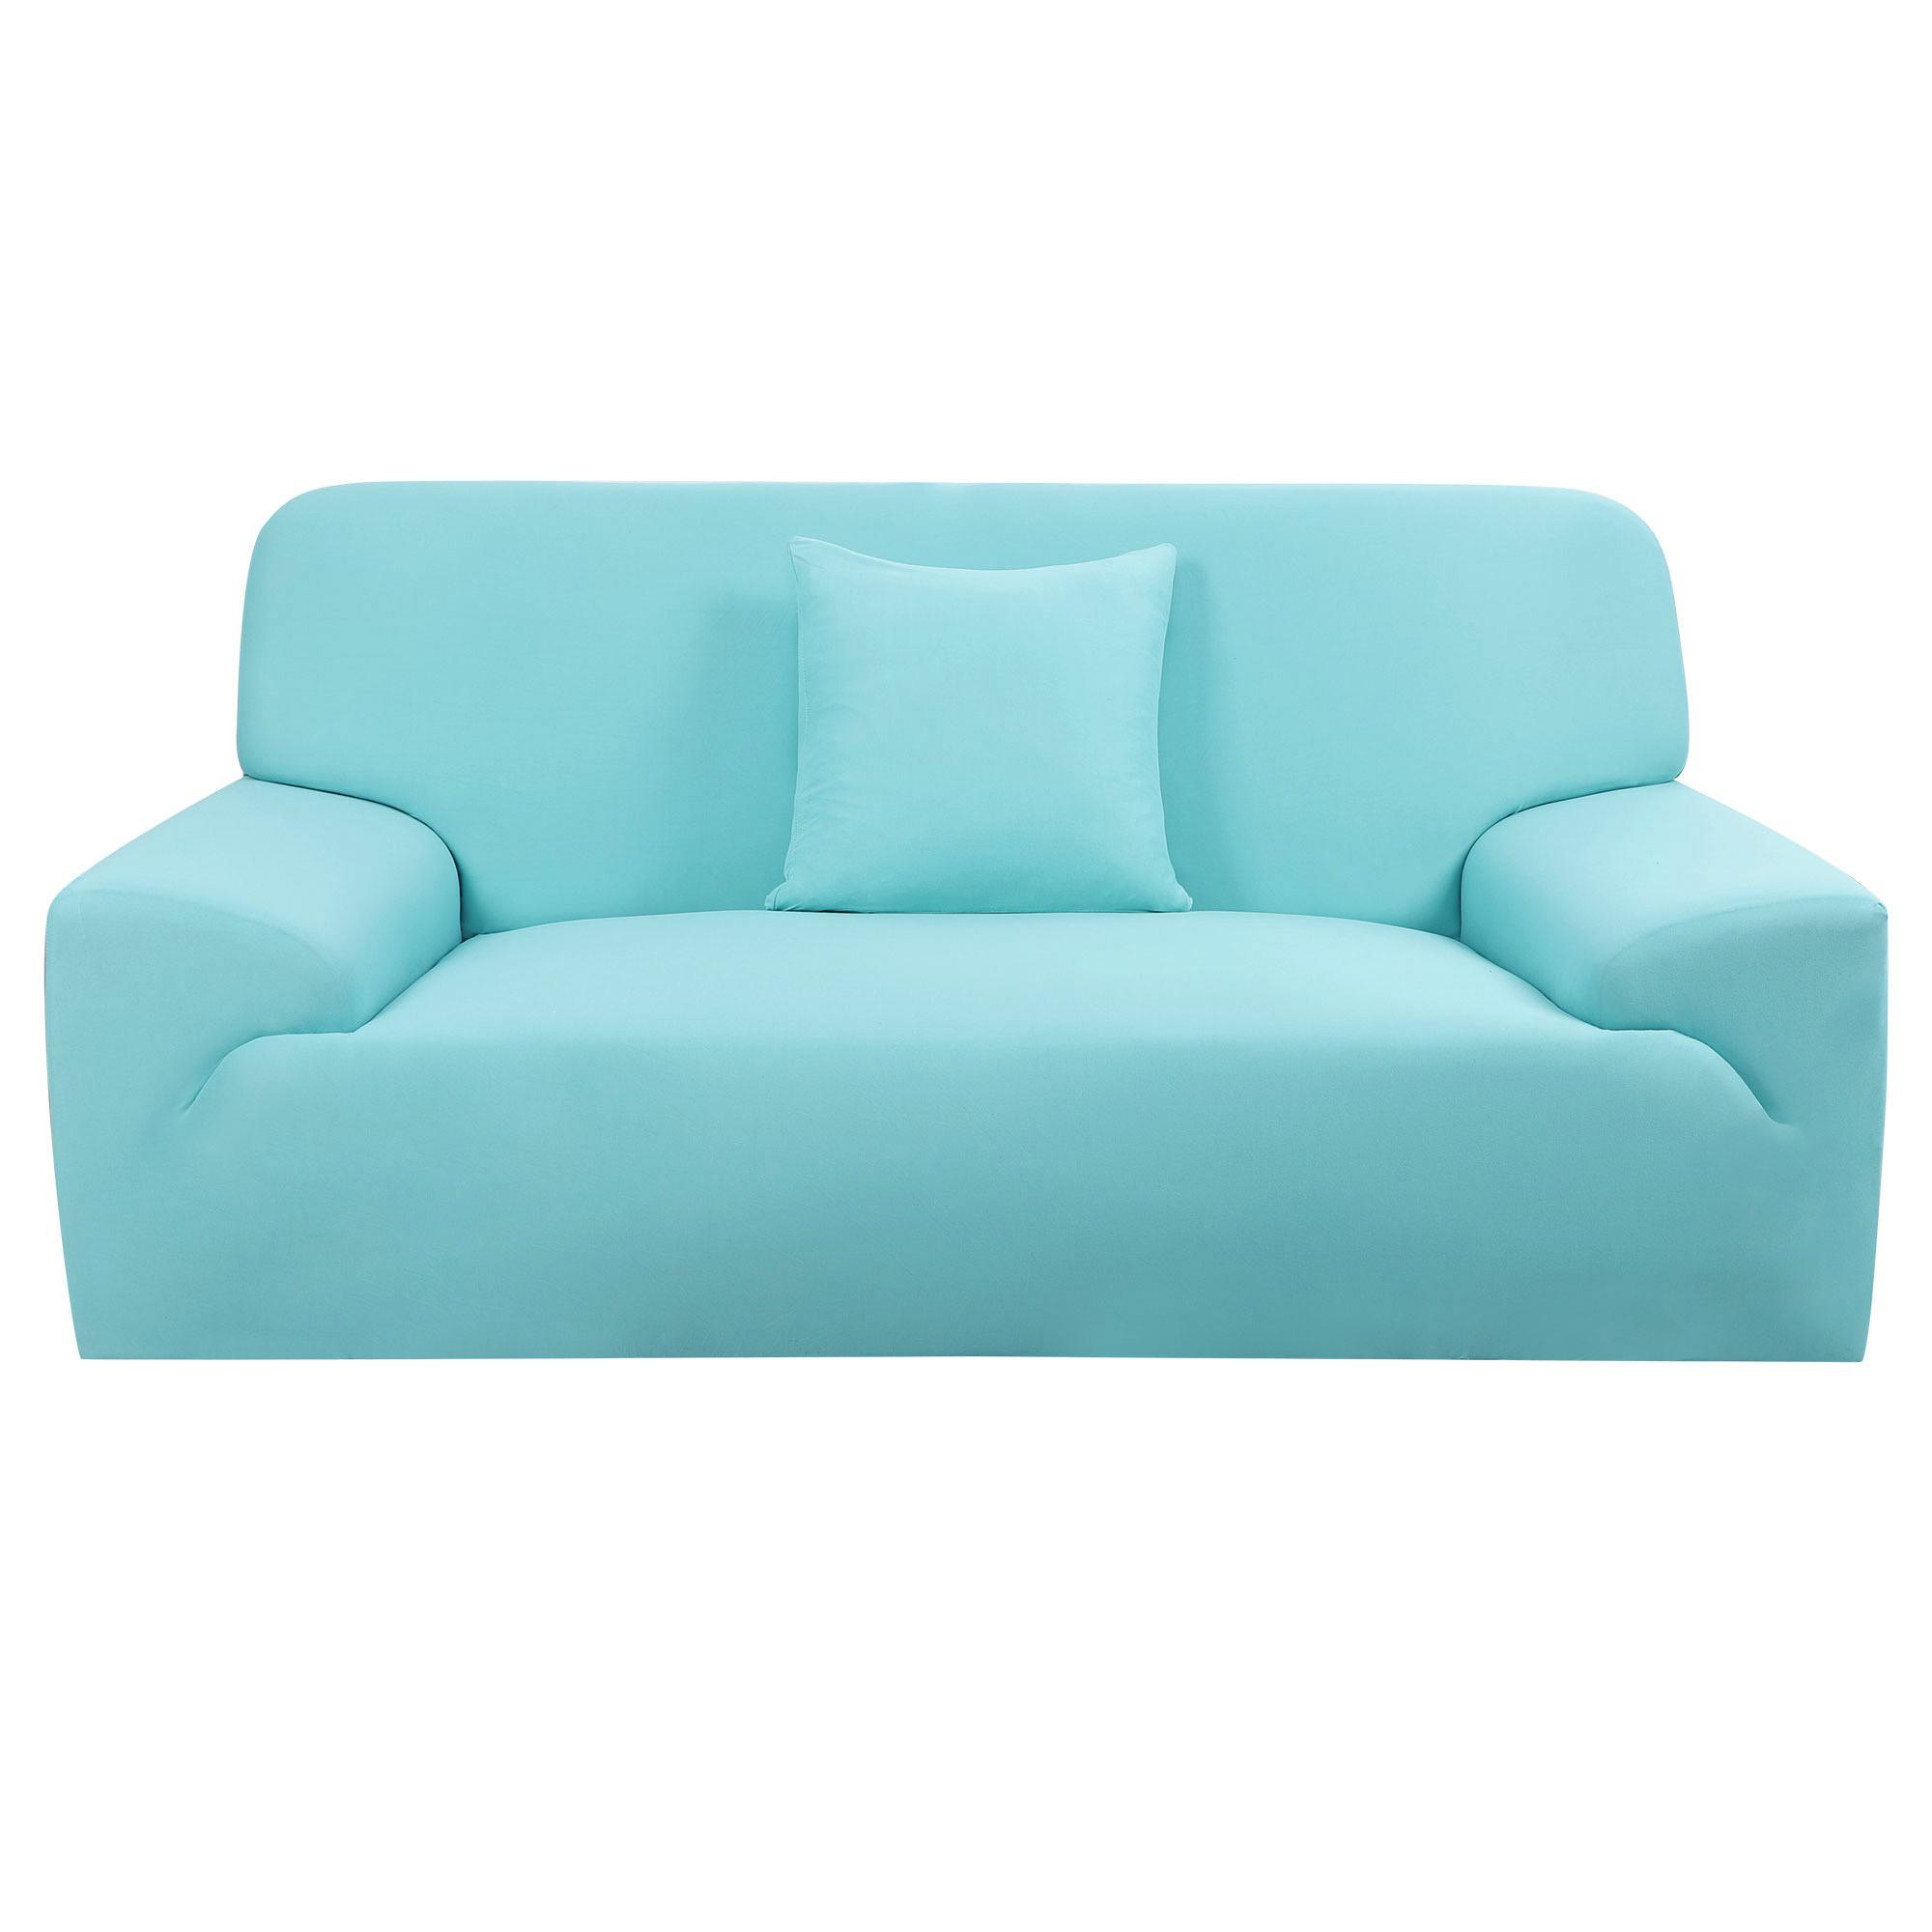 Household Sofa Couch Loveseat Elastic Strap Cover Slipcover Blue 55''-74''